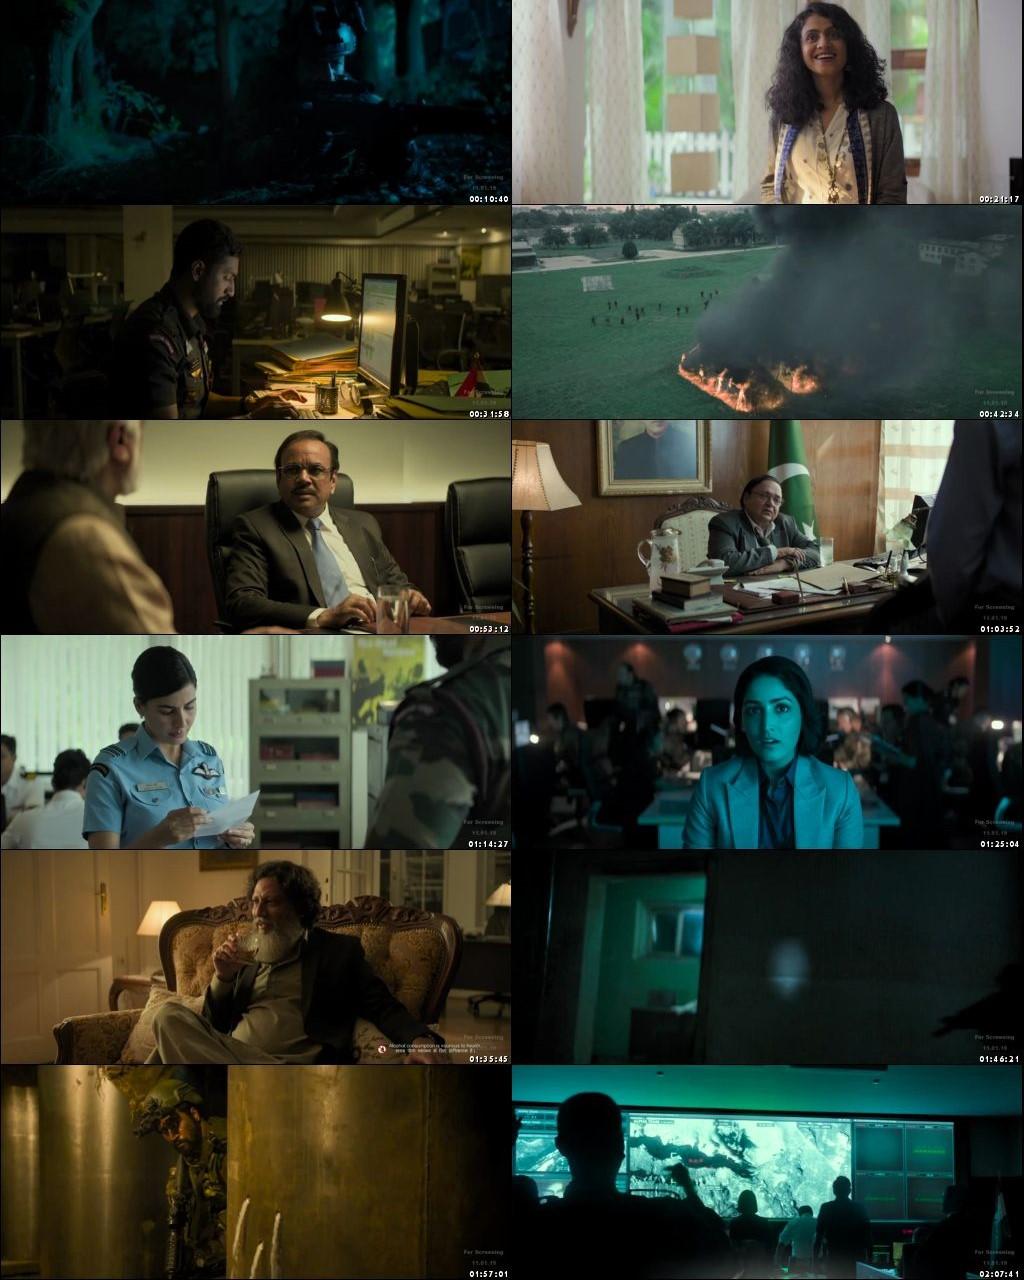 Uri: The Surgical Strike 2019 Full Hindi Movie Download HDRip 720p